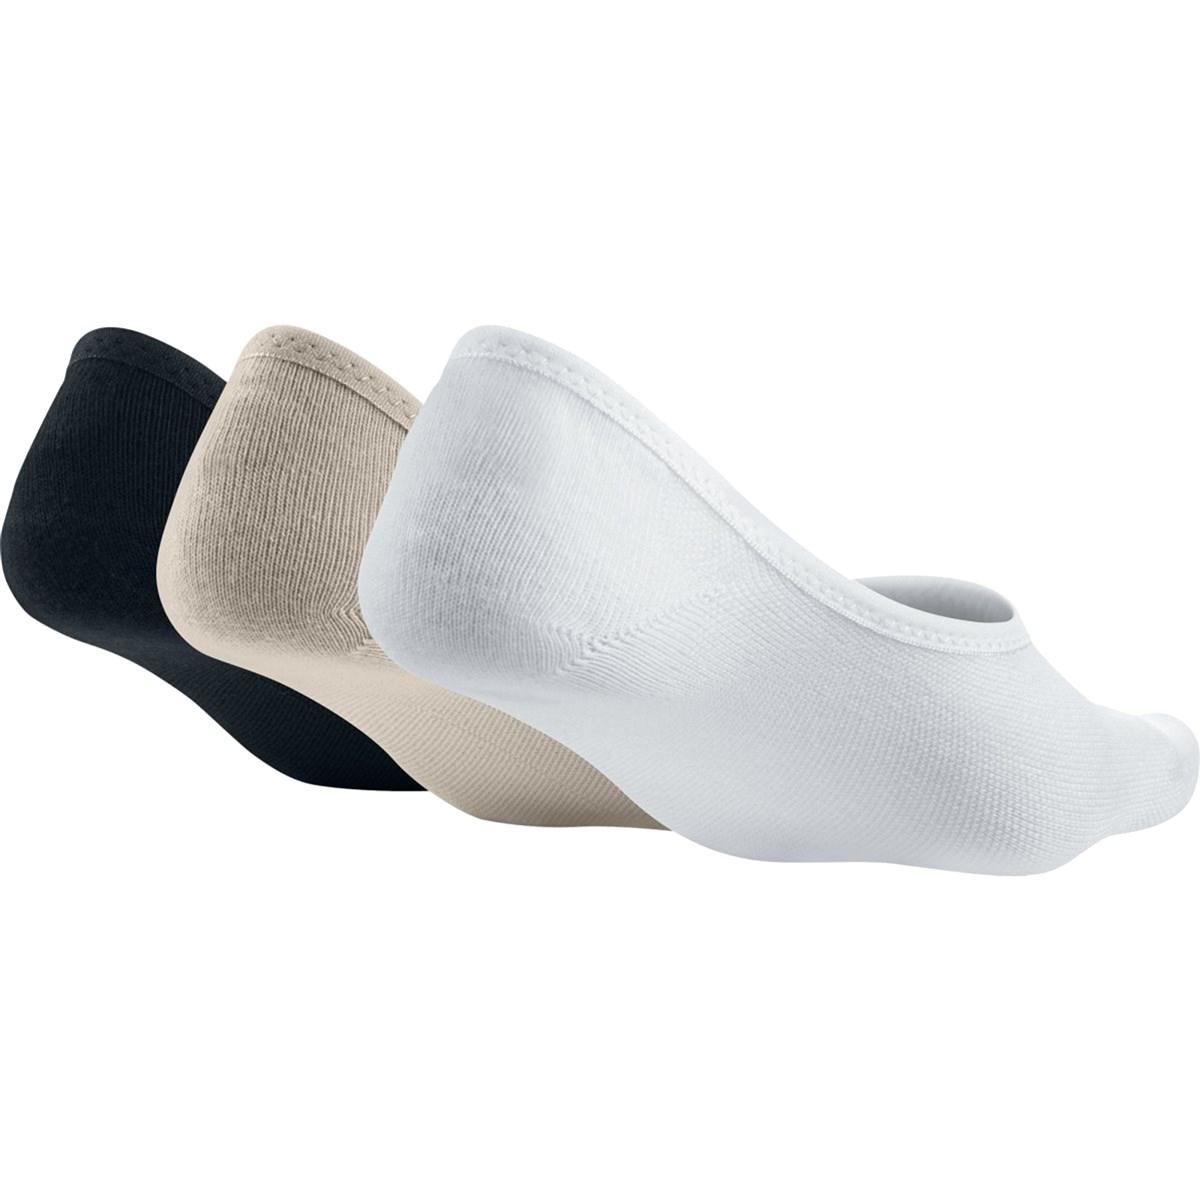 Everyday Lightweight 3 Çift Kısa Spor Çorap (SX4863-900)